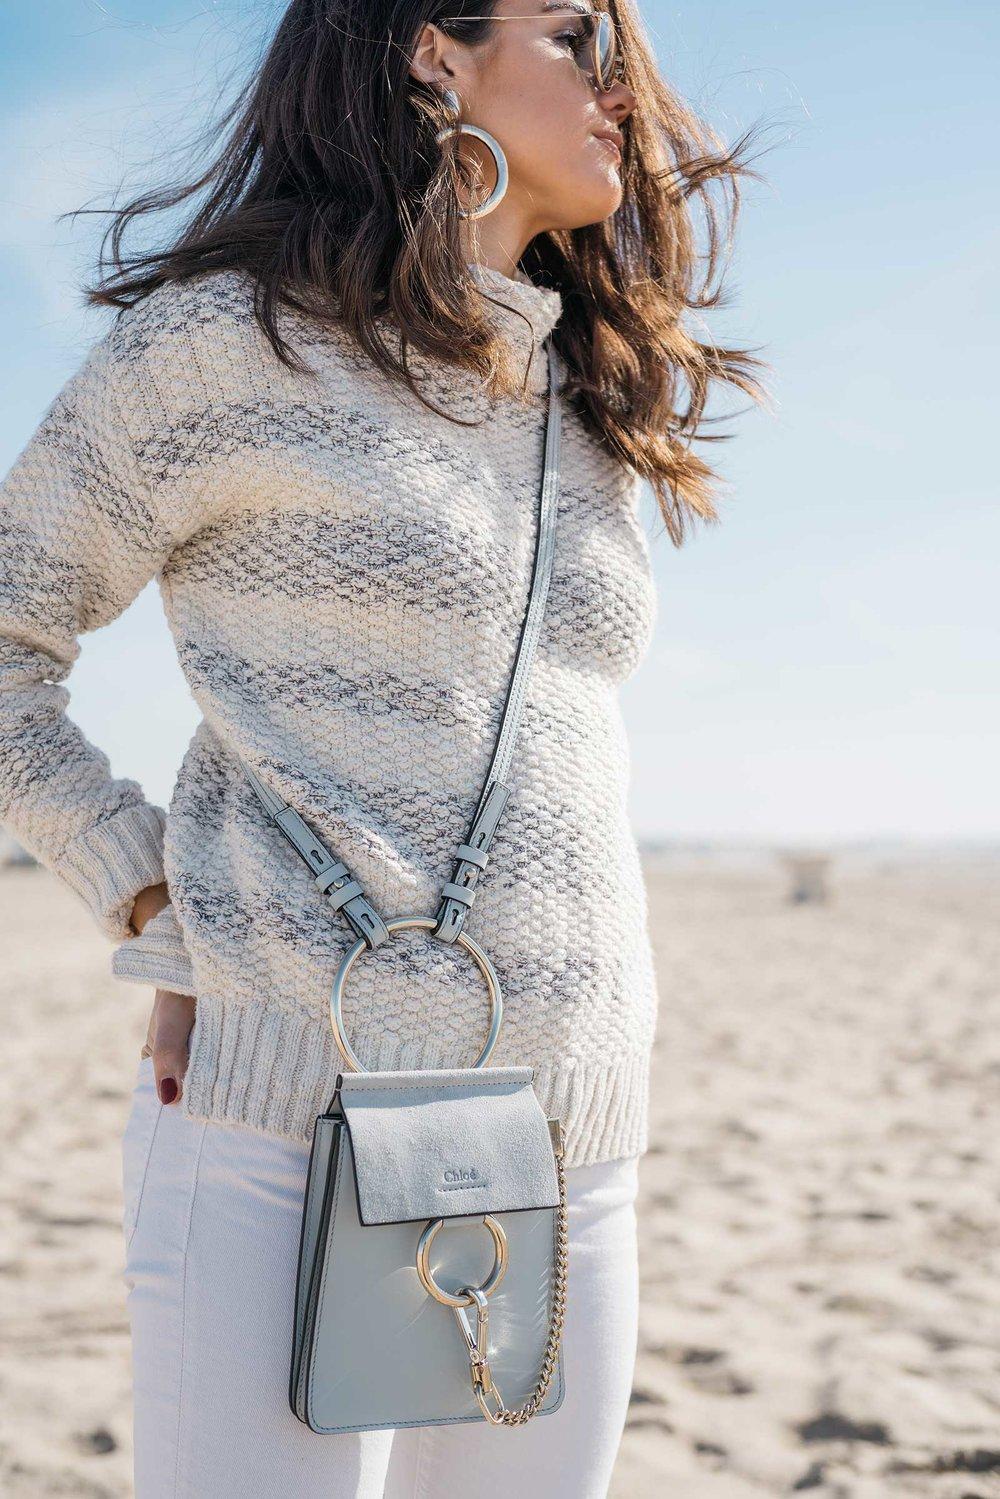 O'Neill-Livie-Striped-Mock-Neck-Sweater-Chloe-Faye-Small-Leather-Bracelet-Bag-Ray-Ban-53mm-Retro-Sunglasses-2.jpg